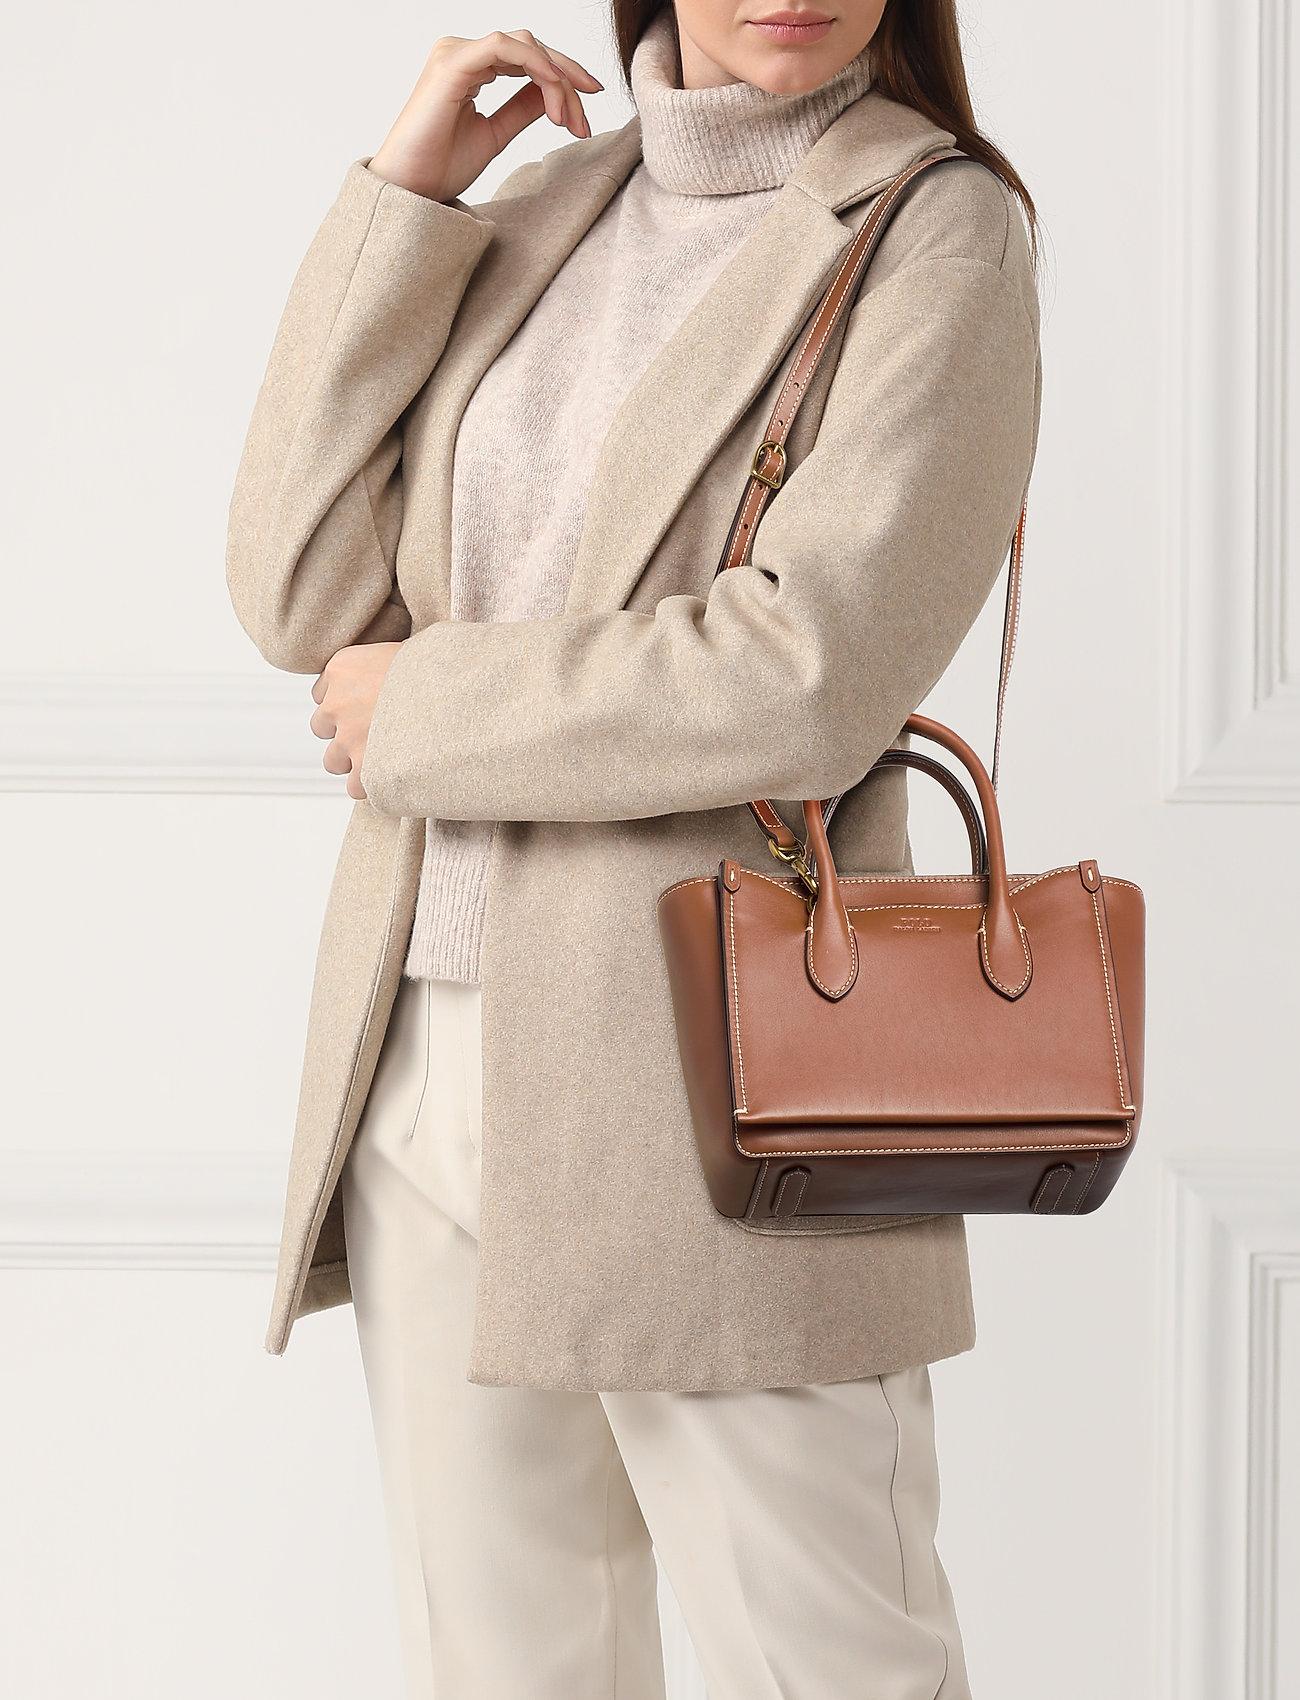 Polo Ralph Lauren Leather Mini Sloane Satchel - SADDLE